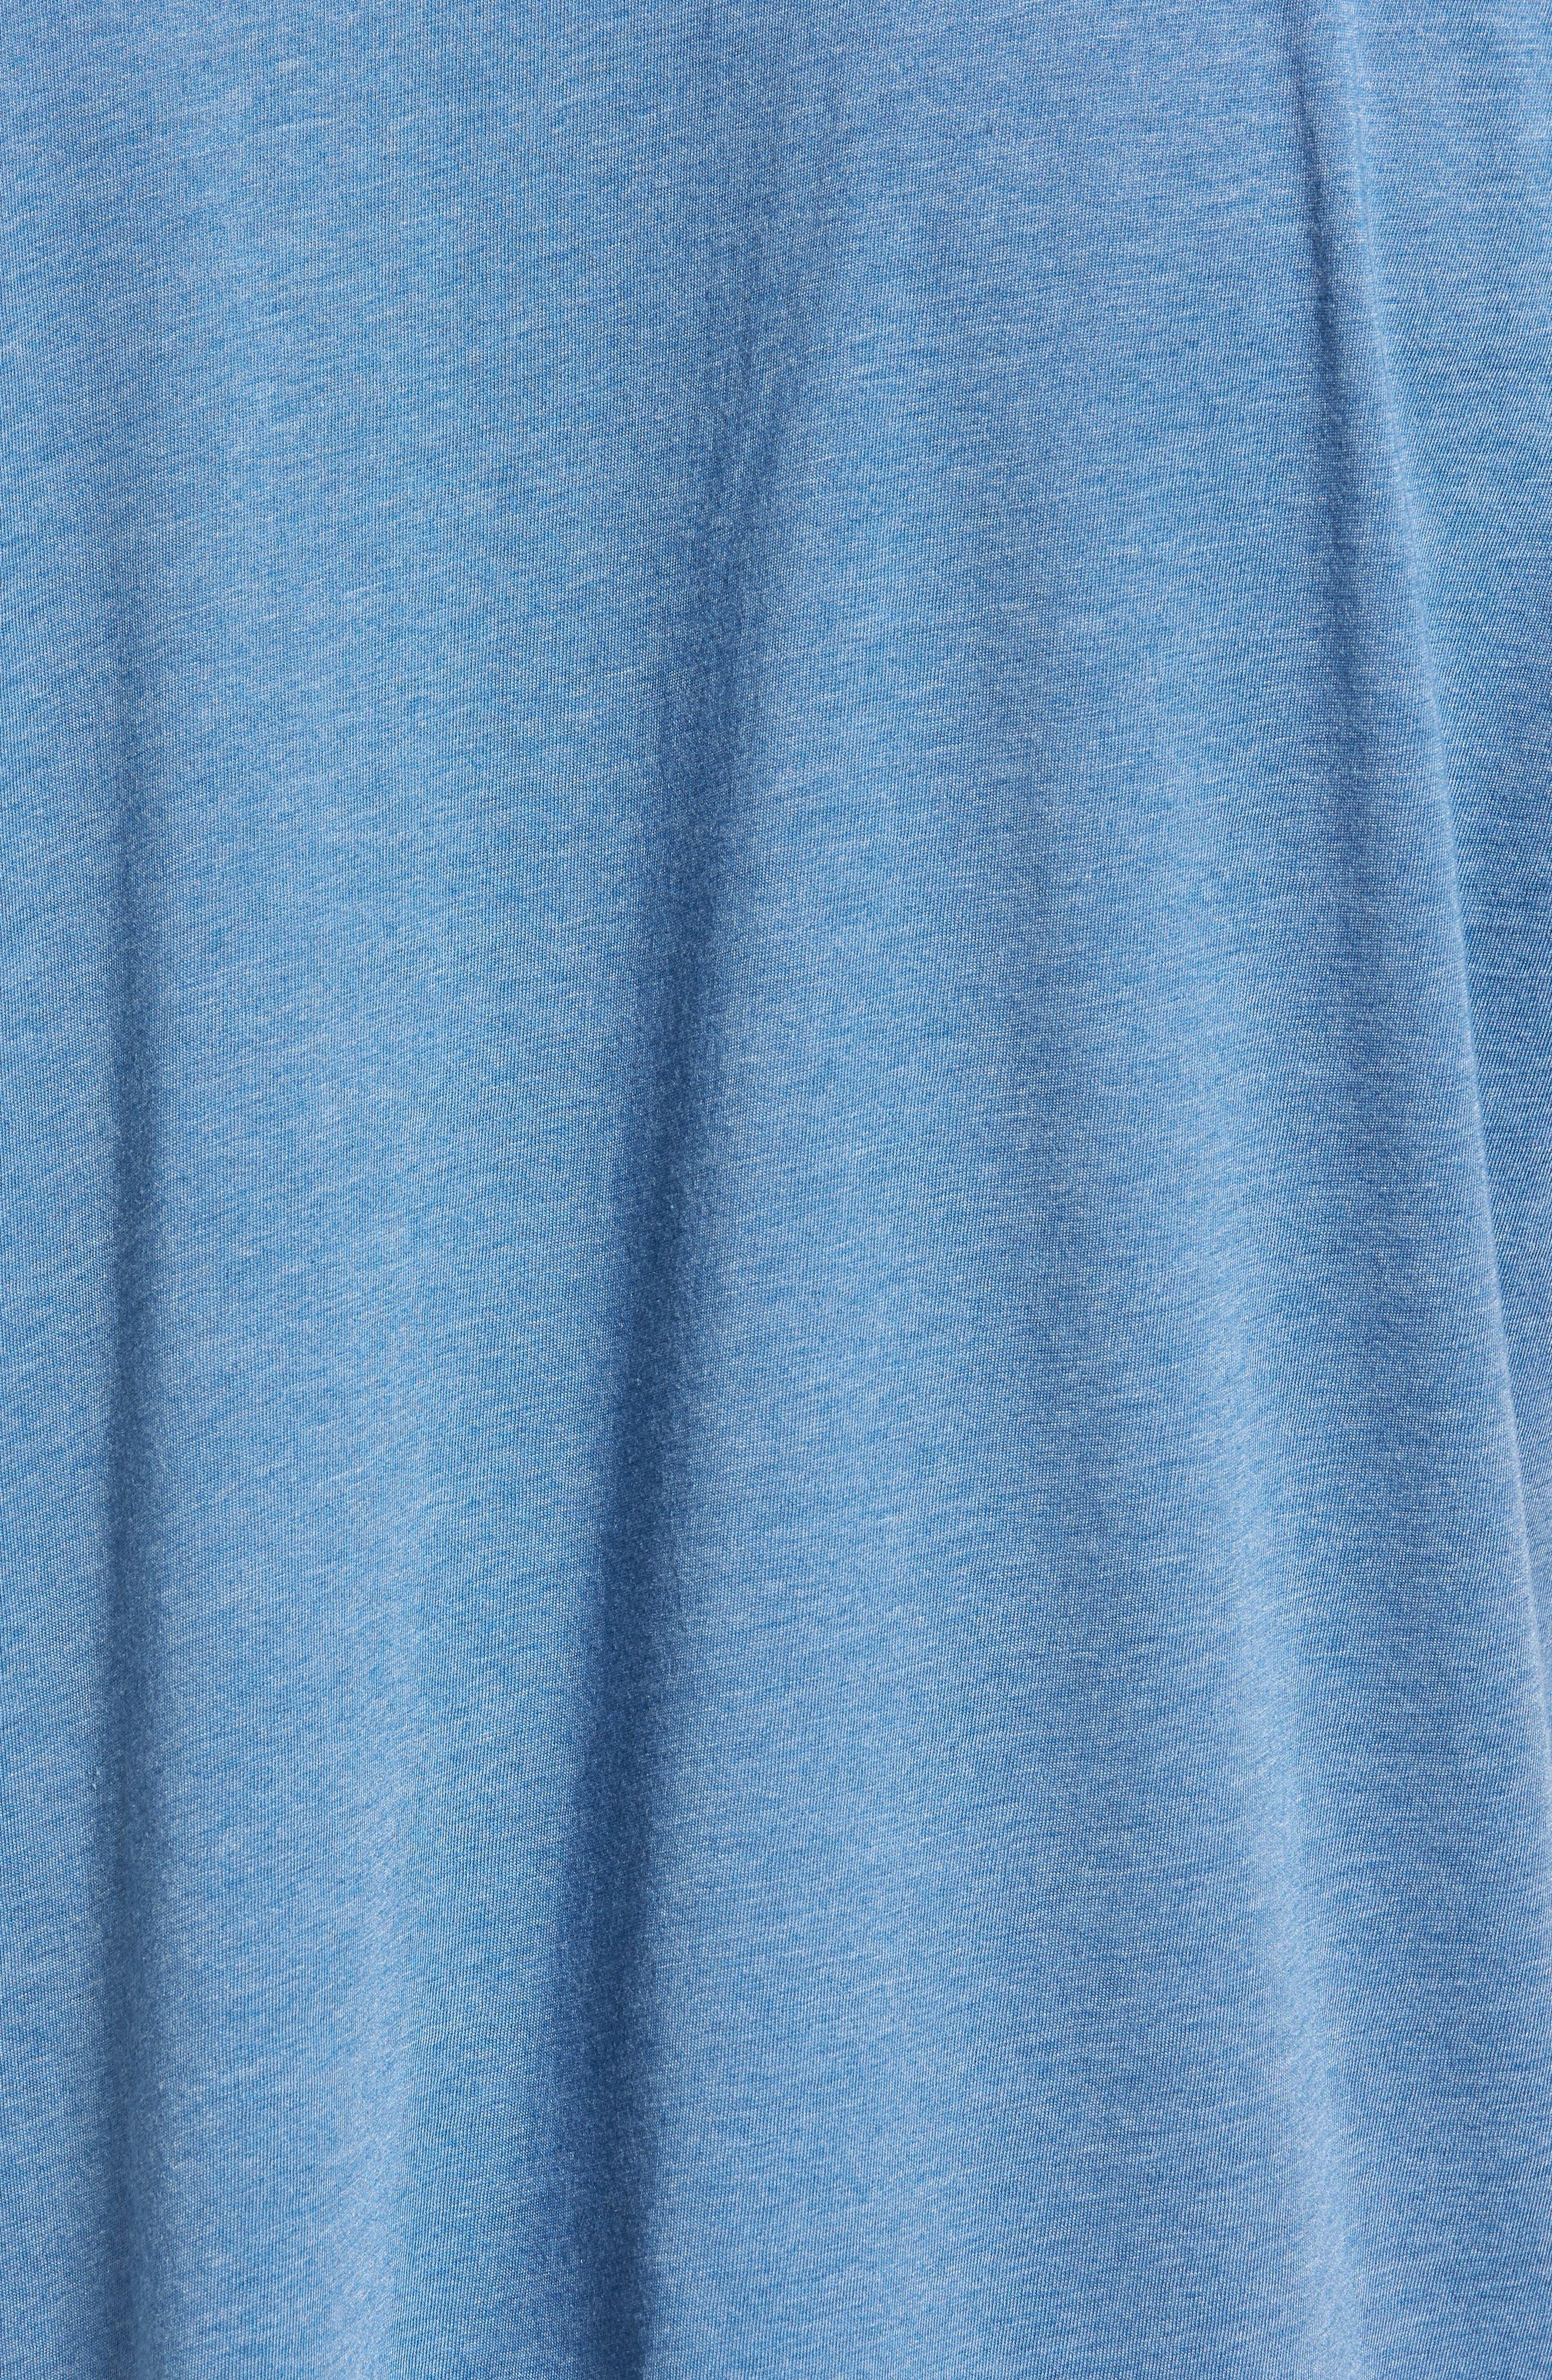 Devo Graphic T-Shirt,                             Alternate thumbnail 5, color,                             Heather Blue